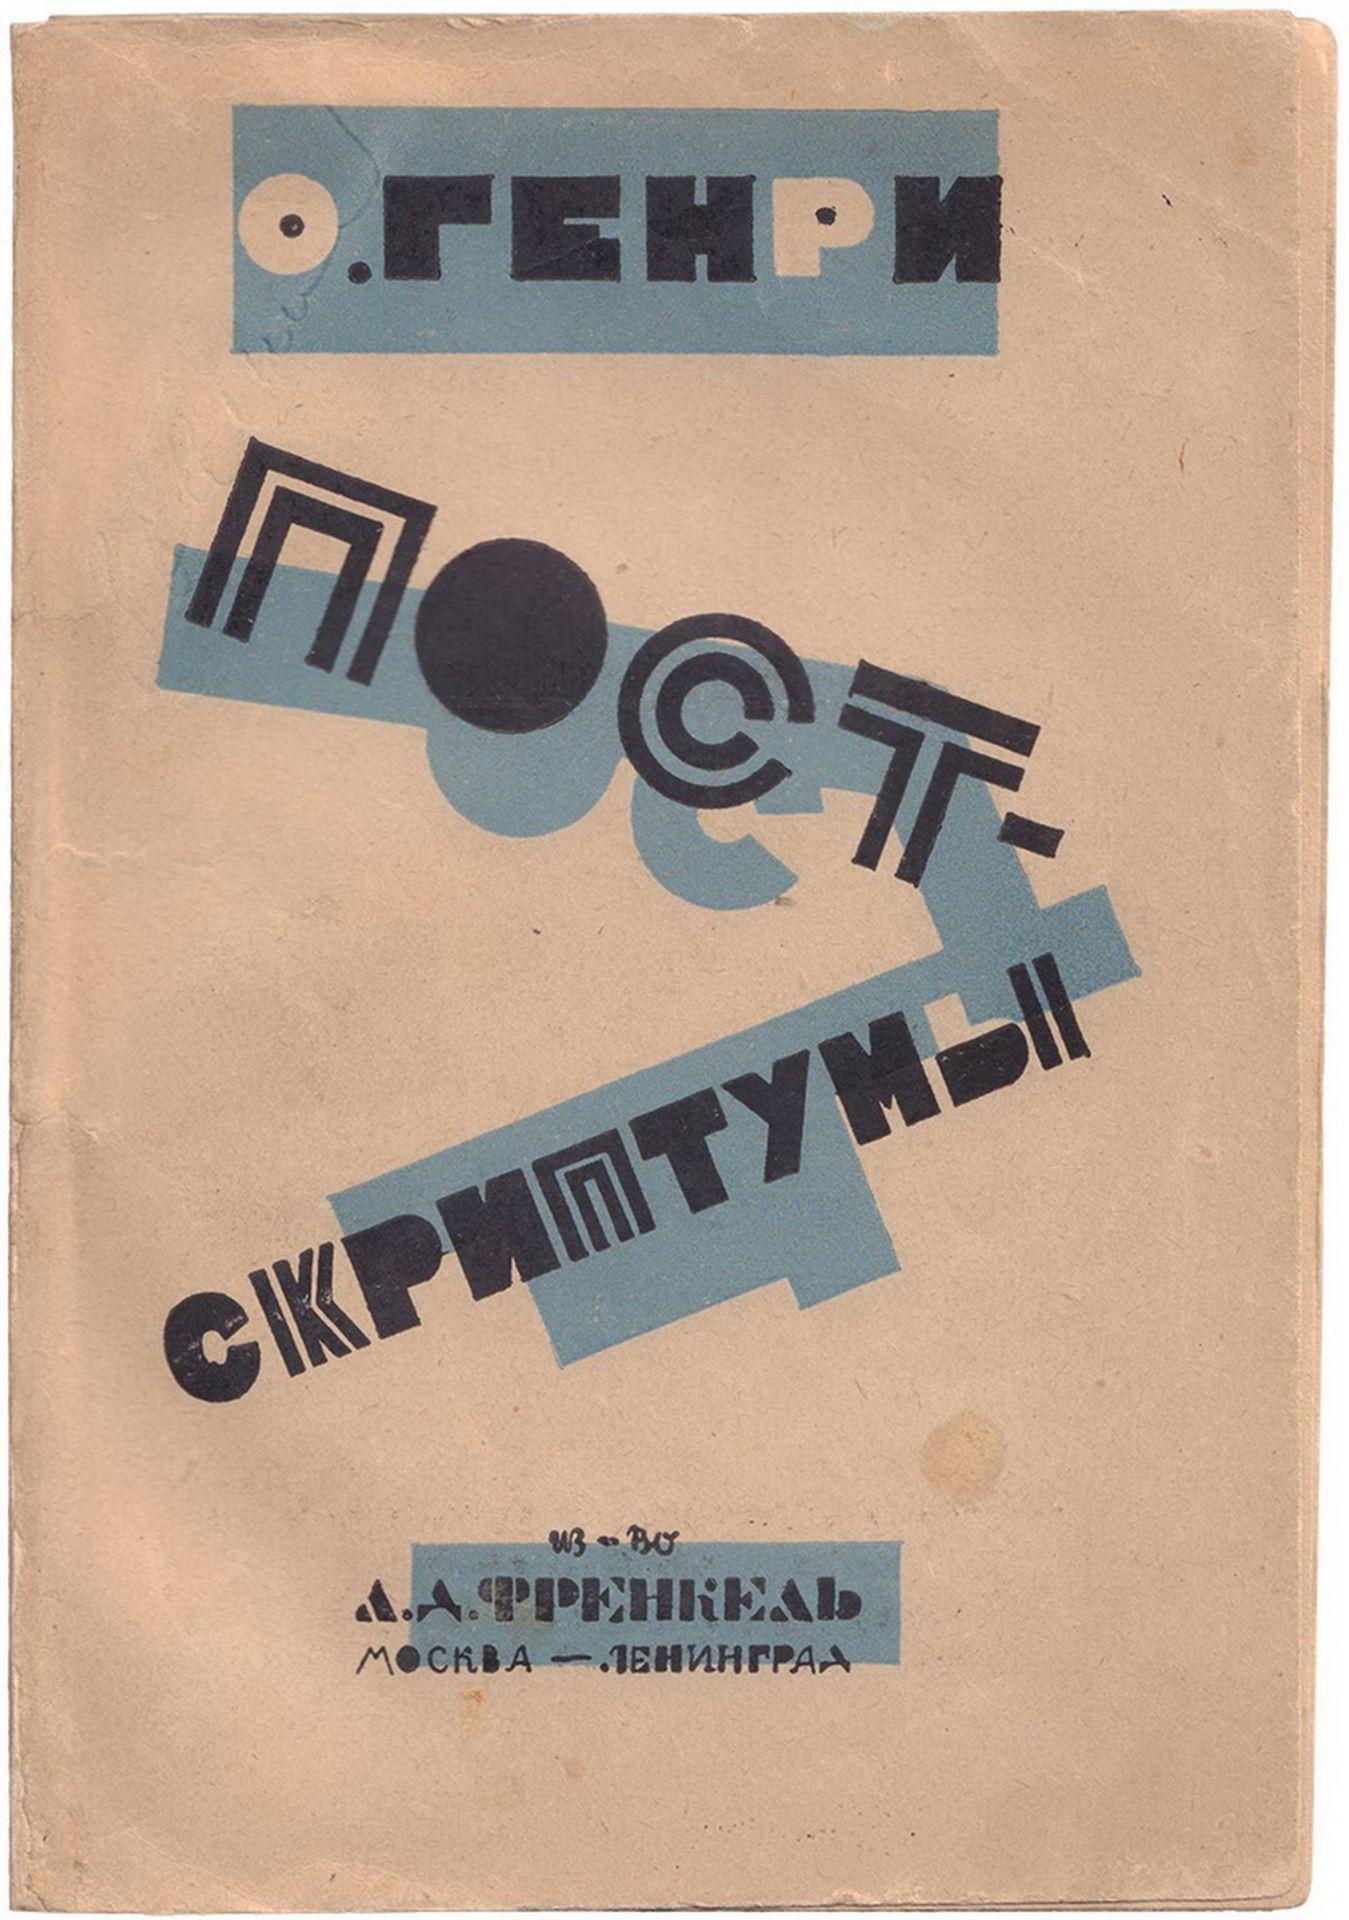 [Constructivist cover. Soviet art]. O. Henry. Some postscripts: [Novels]. - Moscow, Leningrad, 1924.